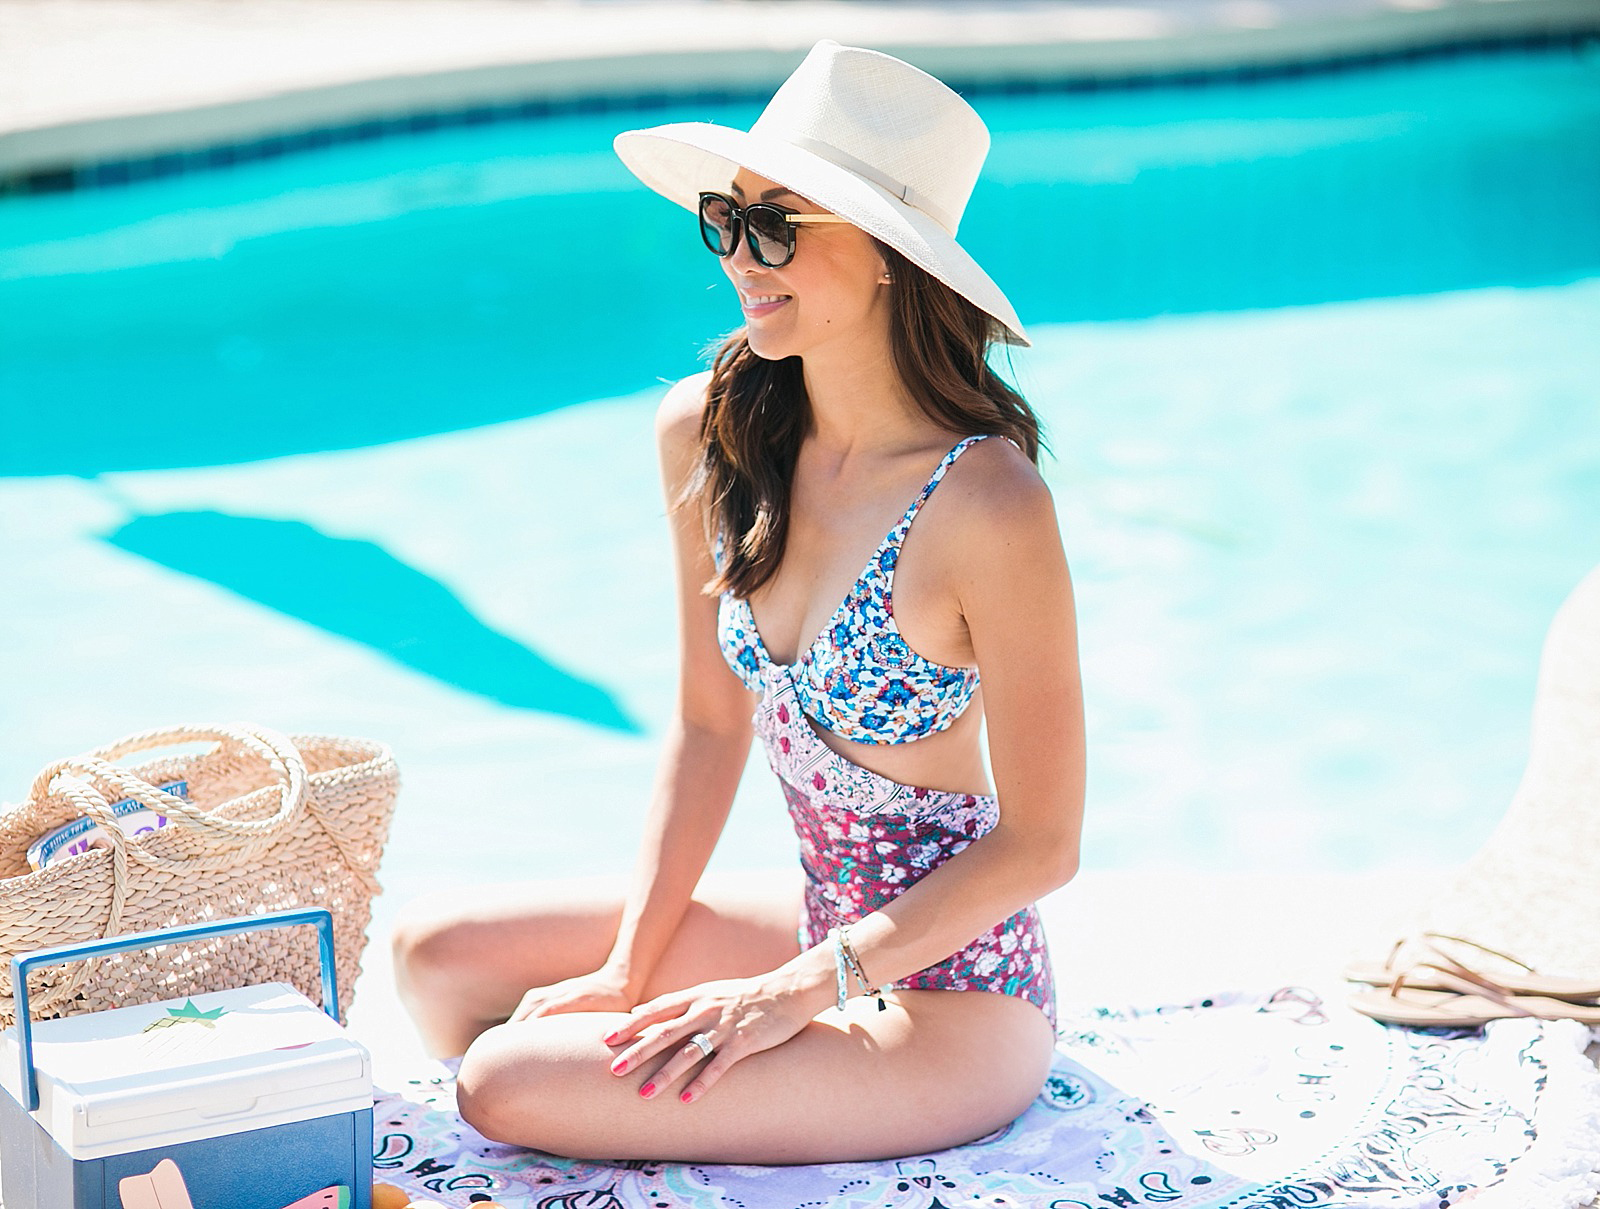 weight-watchers-pool-ready-summer-photoshoot-pool-shoot-model-lifestyle-blogger-arizona-phoenix-diana-elizabeth-blog-_00371